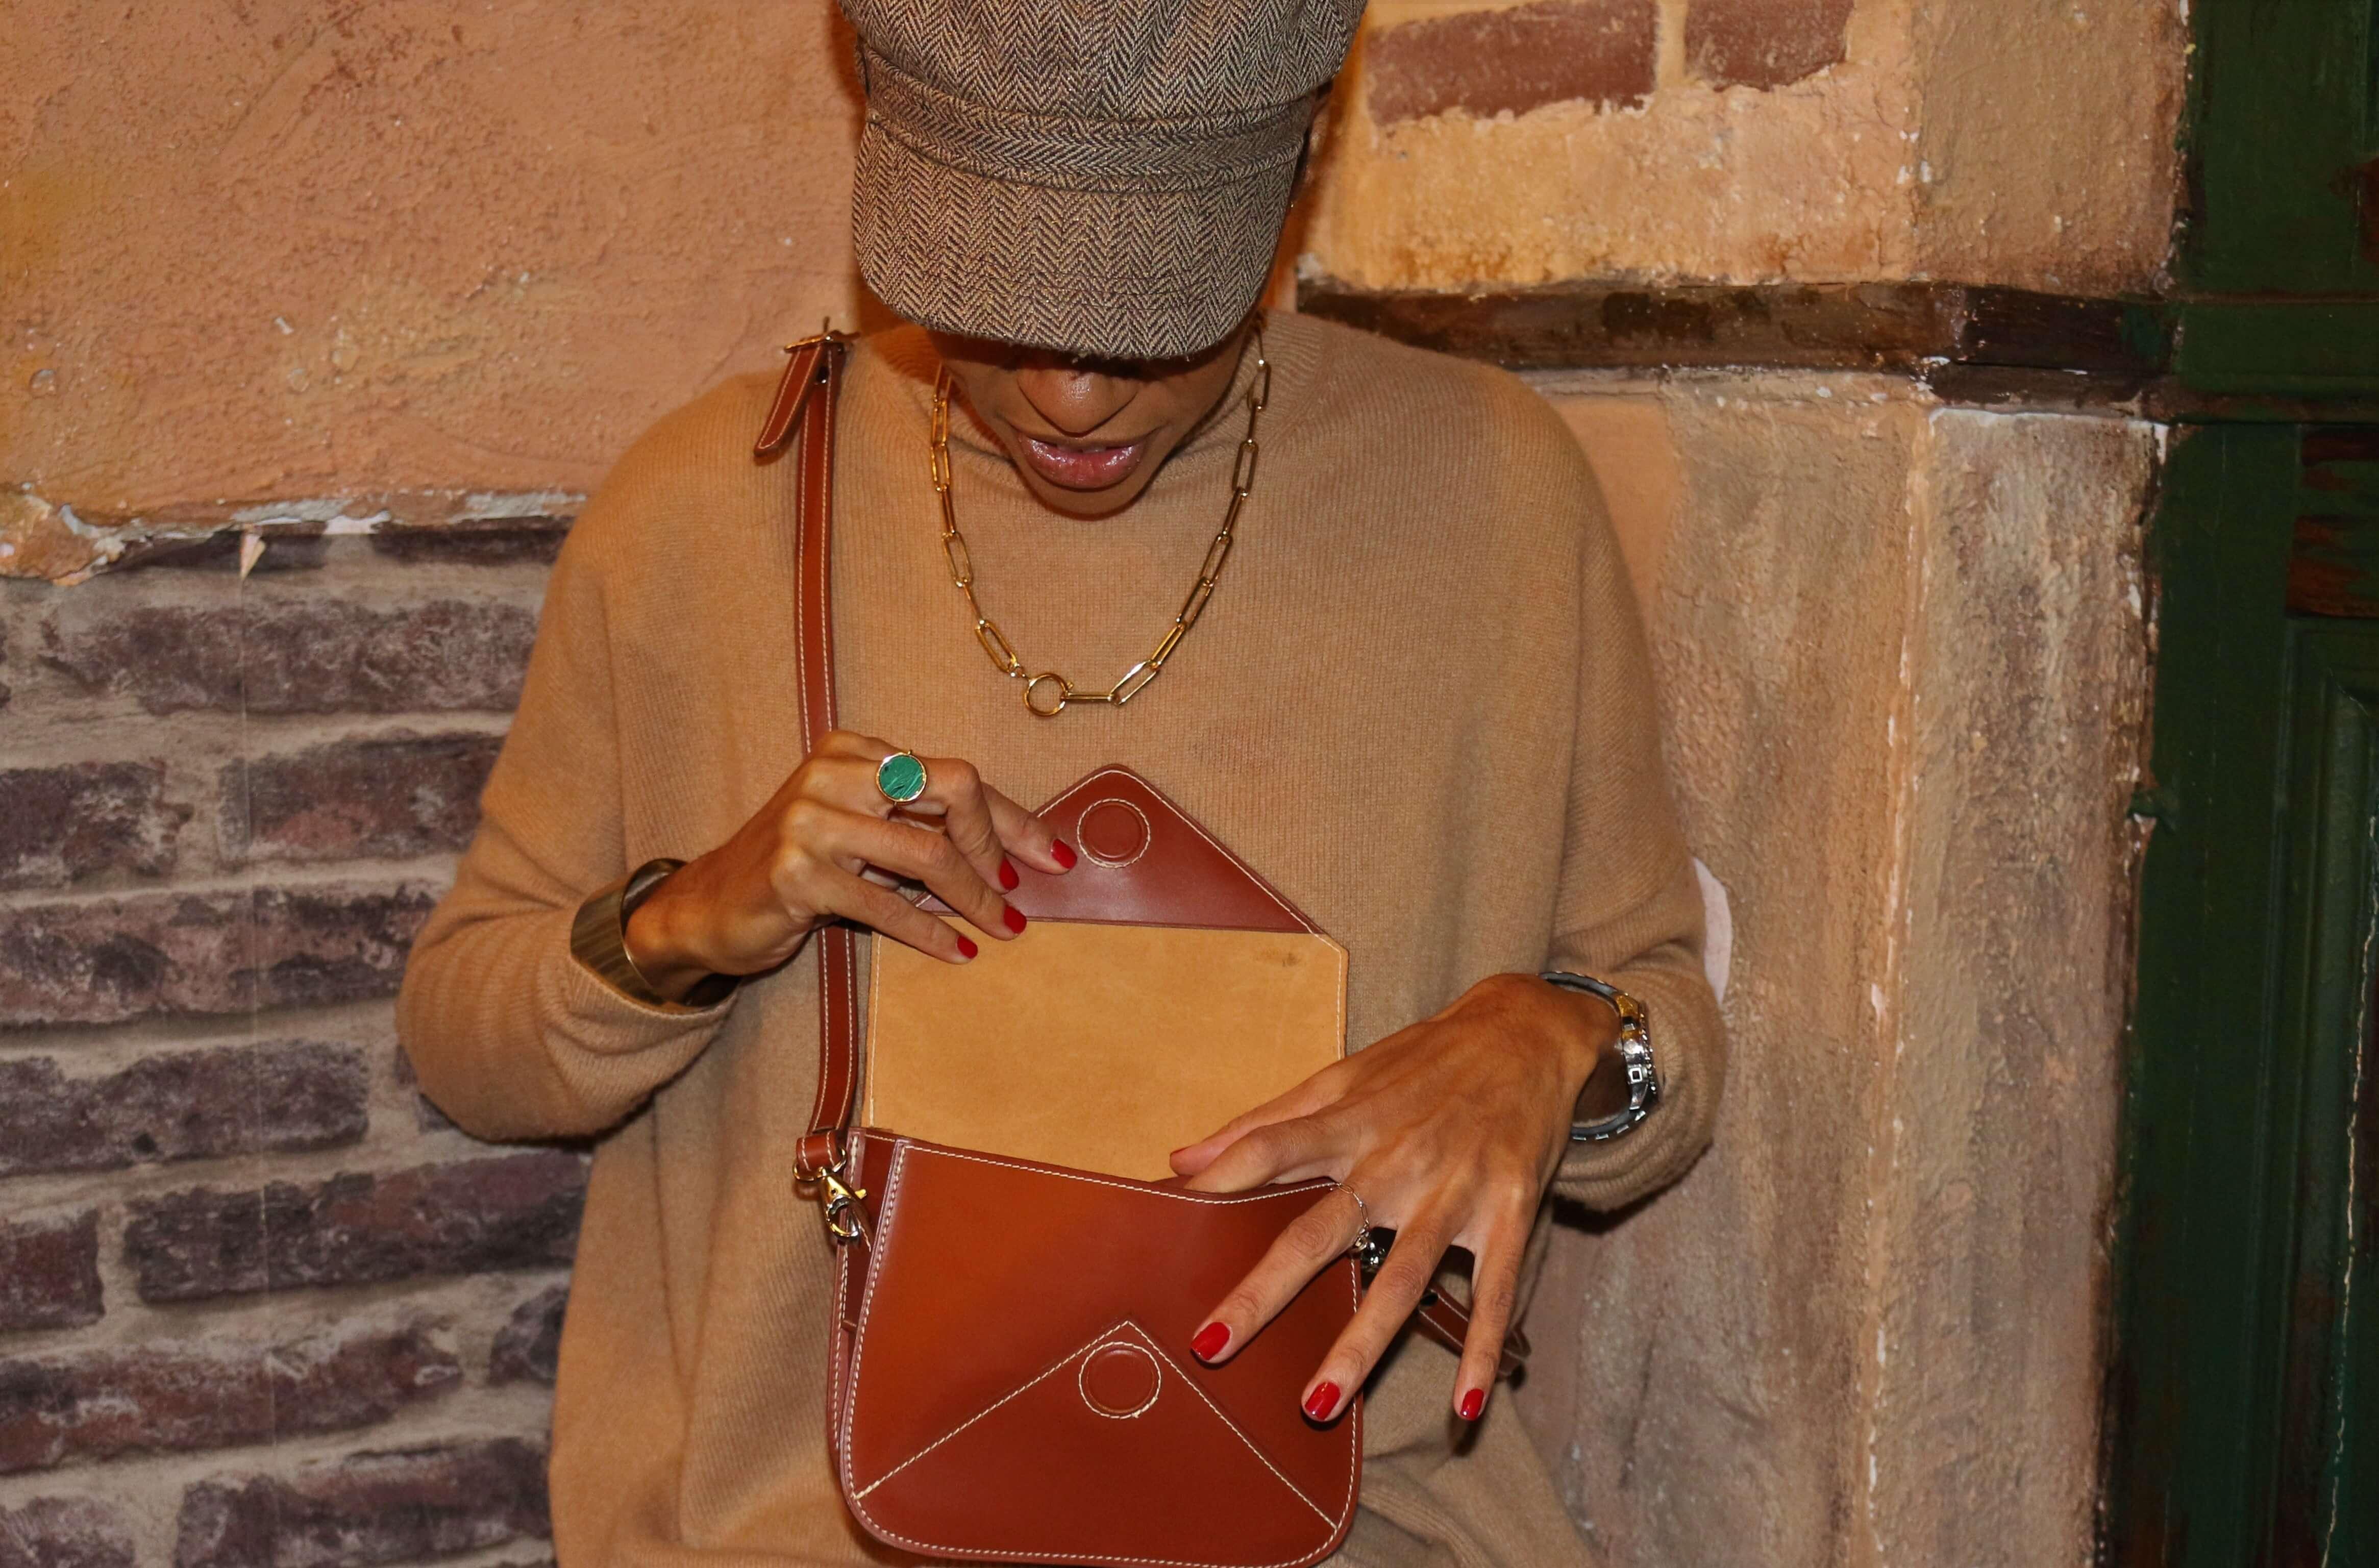 ls artisan maroquinier lyon, Mini INES, image 1